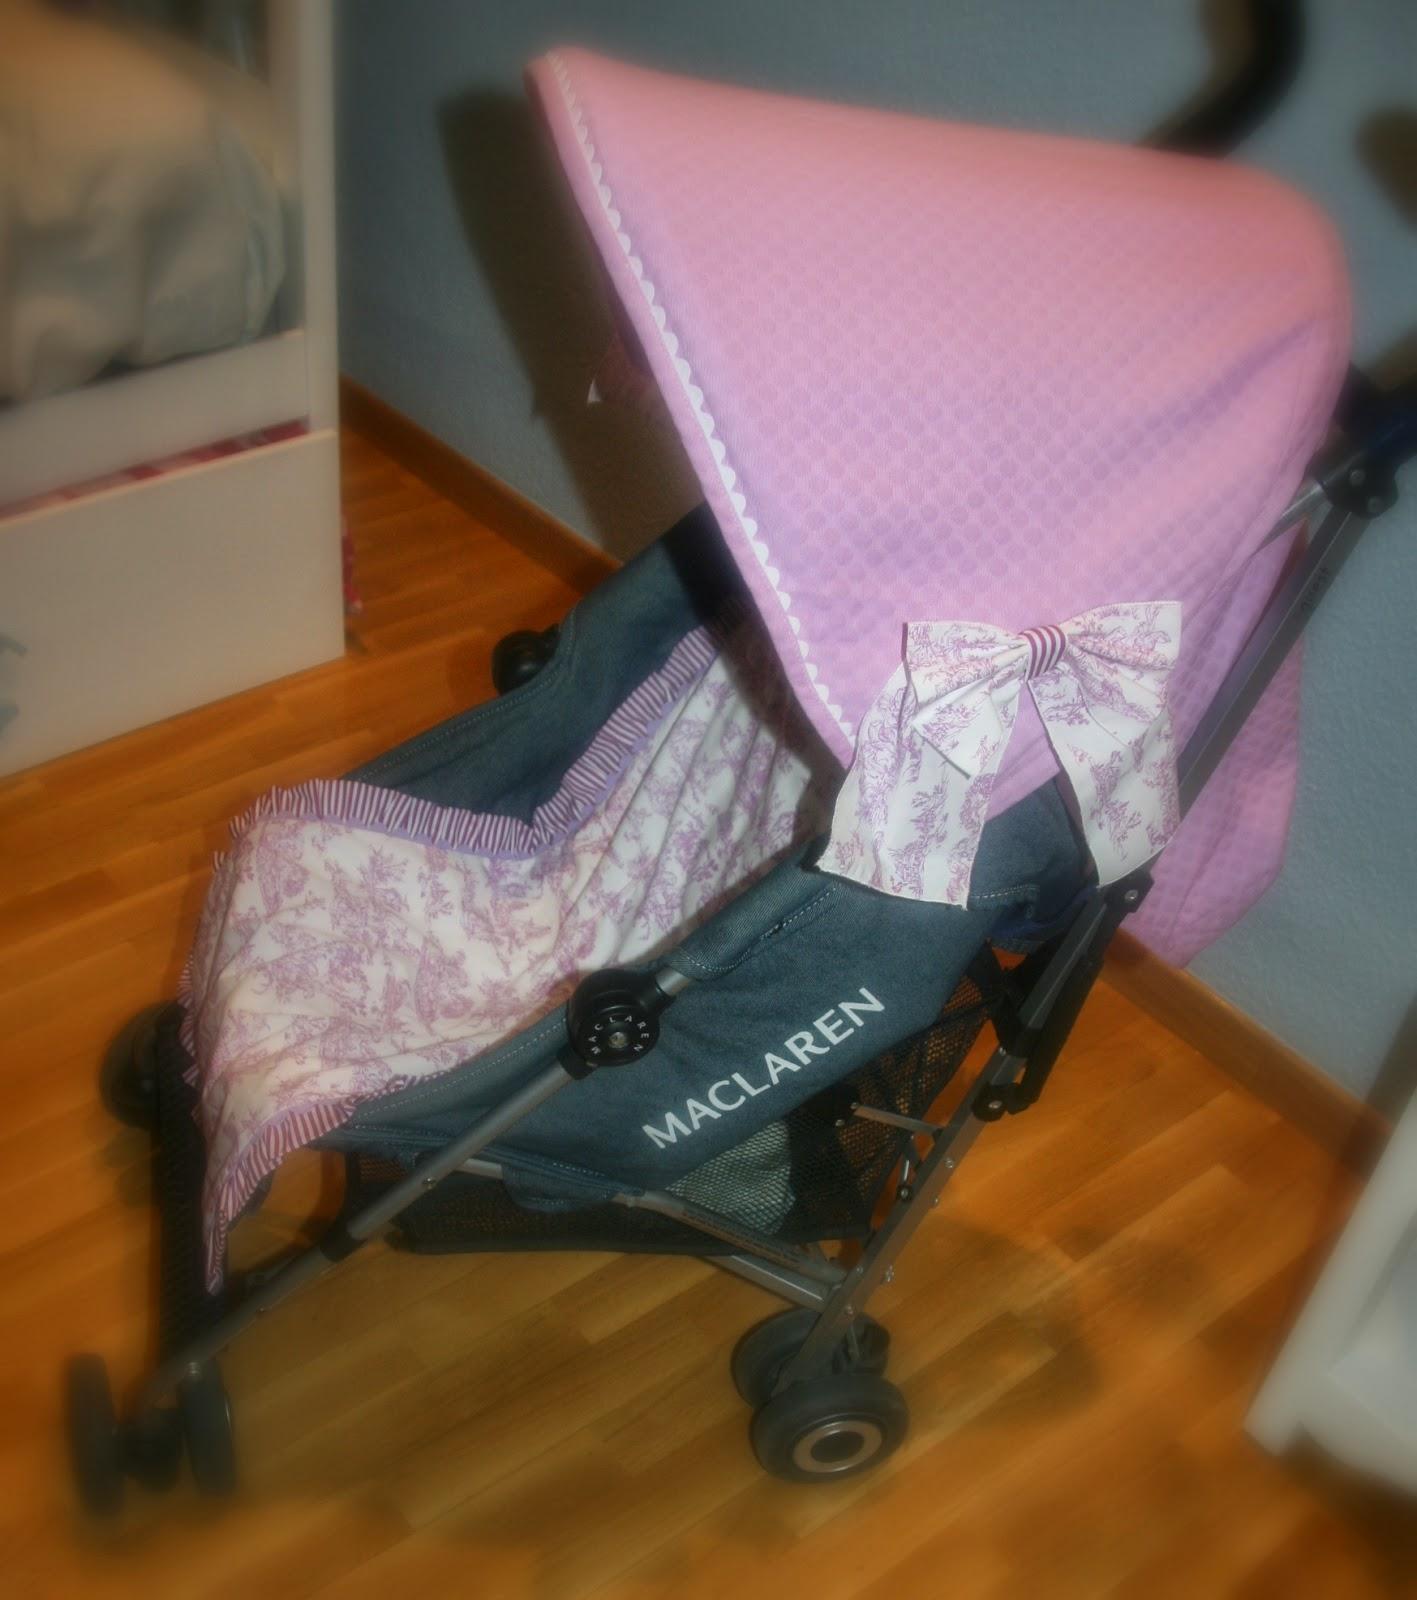 Bebes chic silla ligera for Silla ligera maclaren